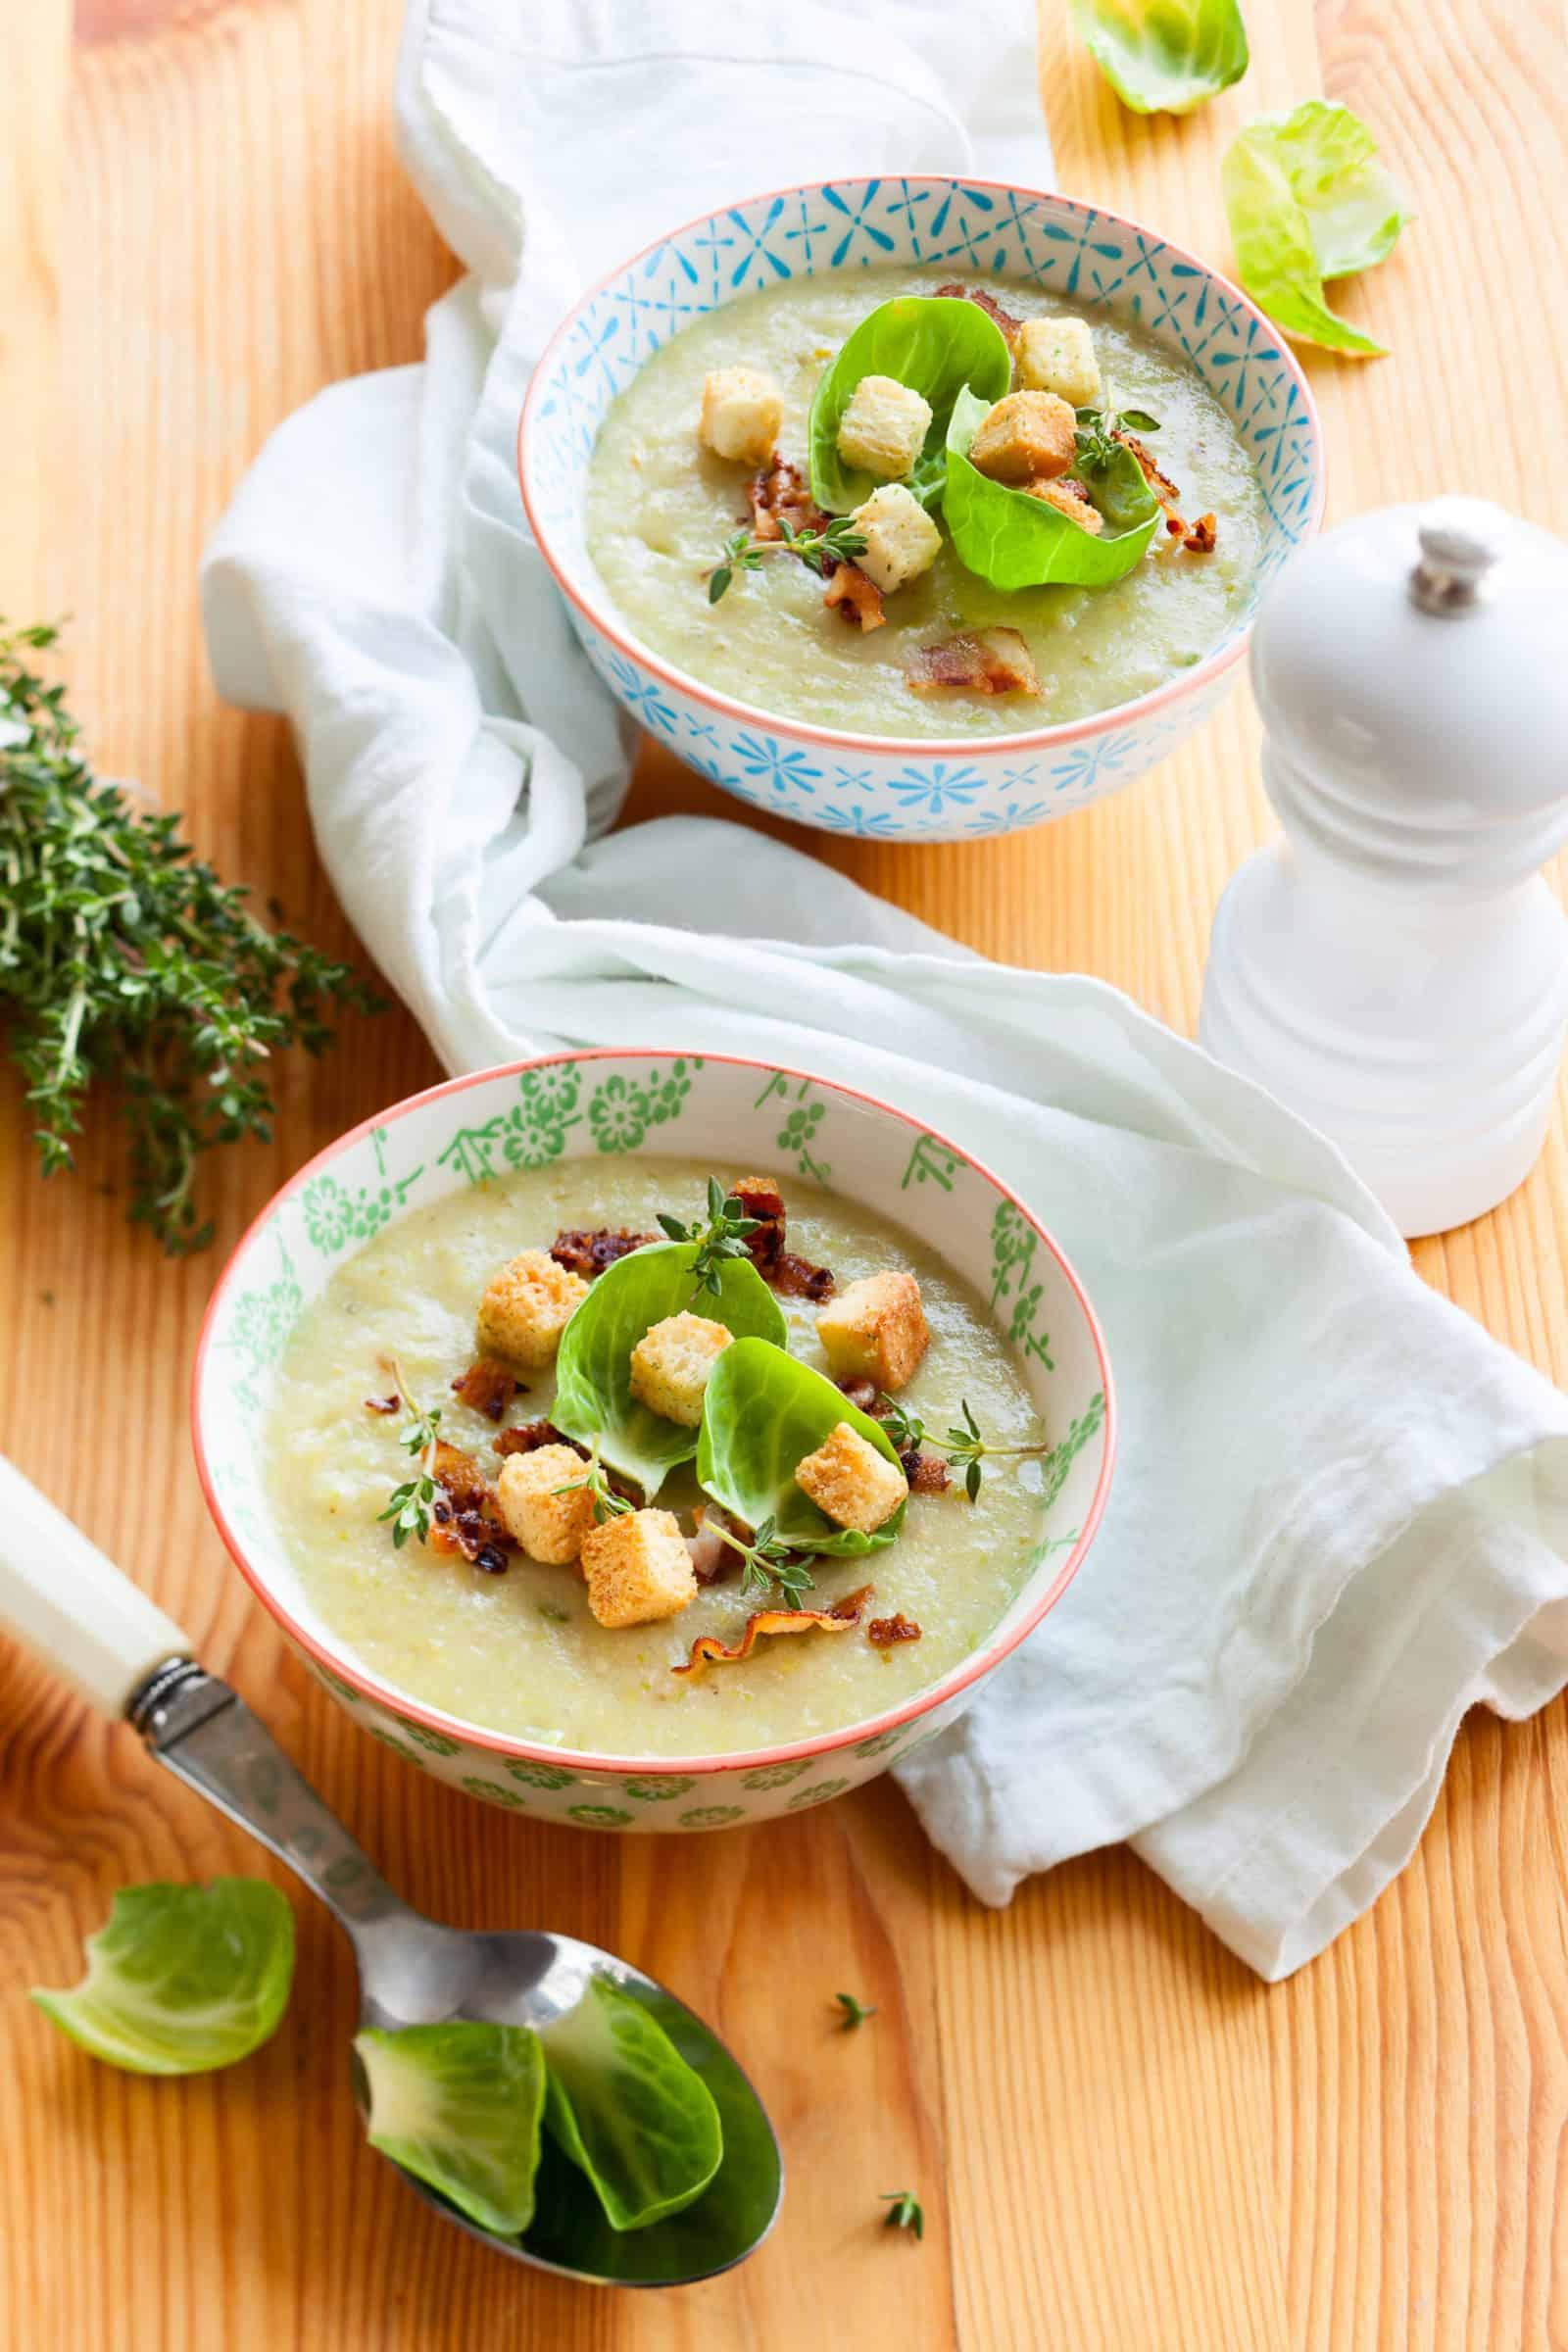 Cremige Rosenkohlsuppe aus dem Thermomix® - Foto: Shutterstock/Kolpakova Svetlana